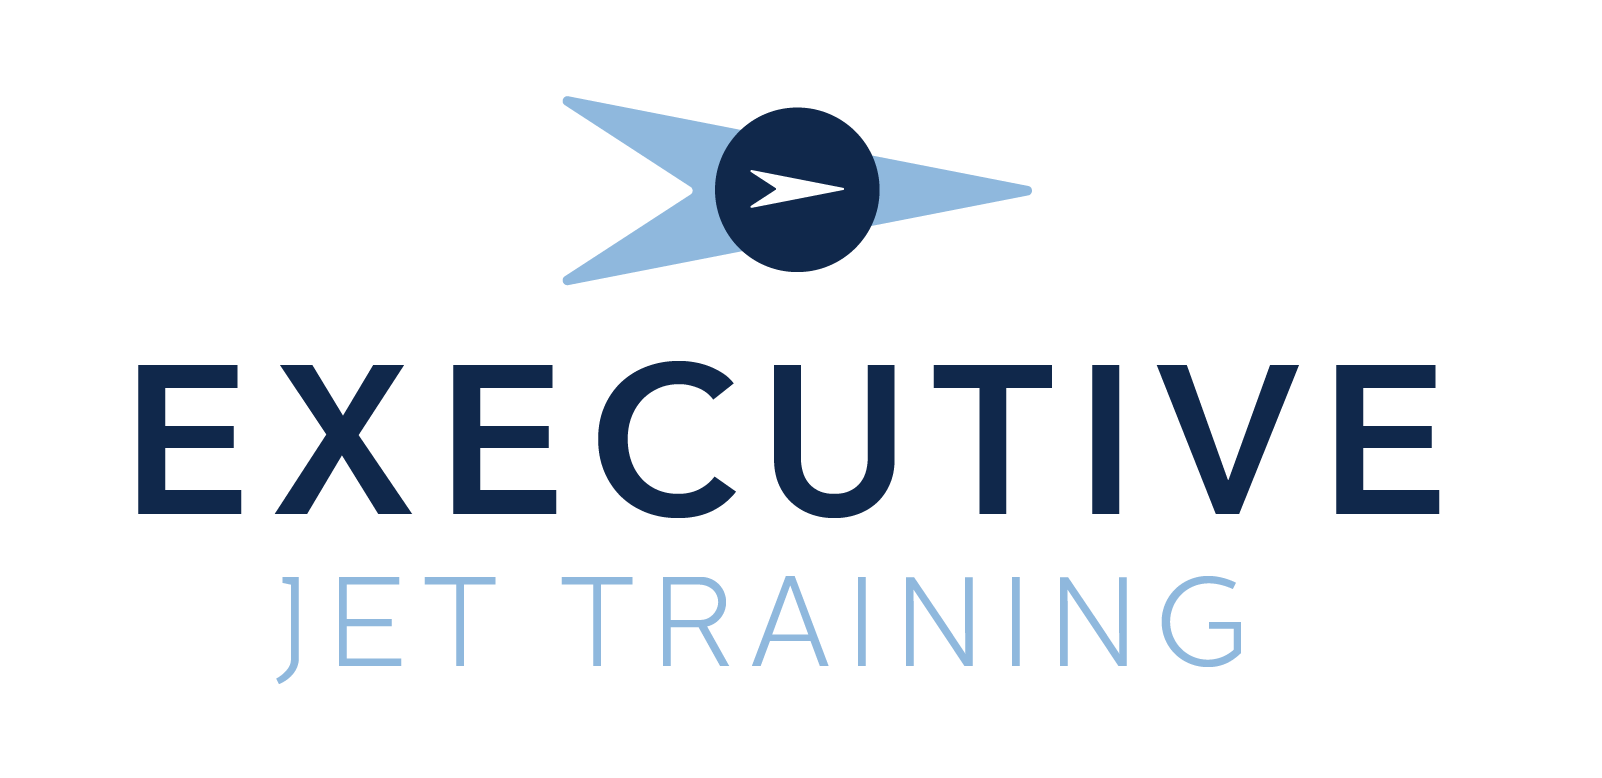 Executive Jet Training